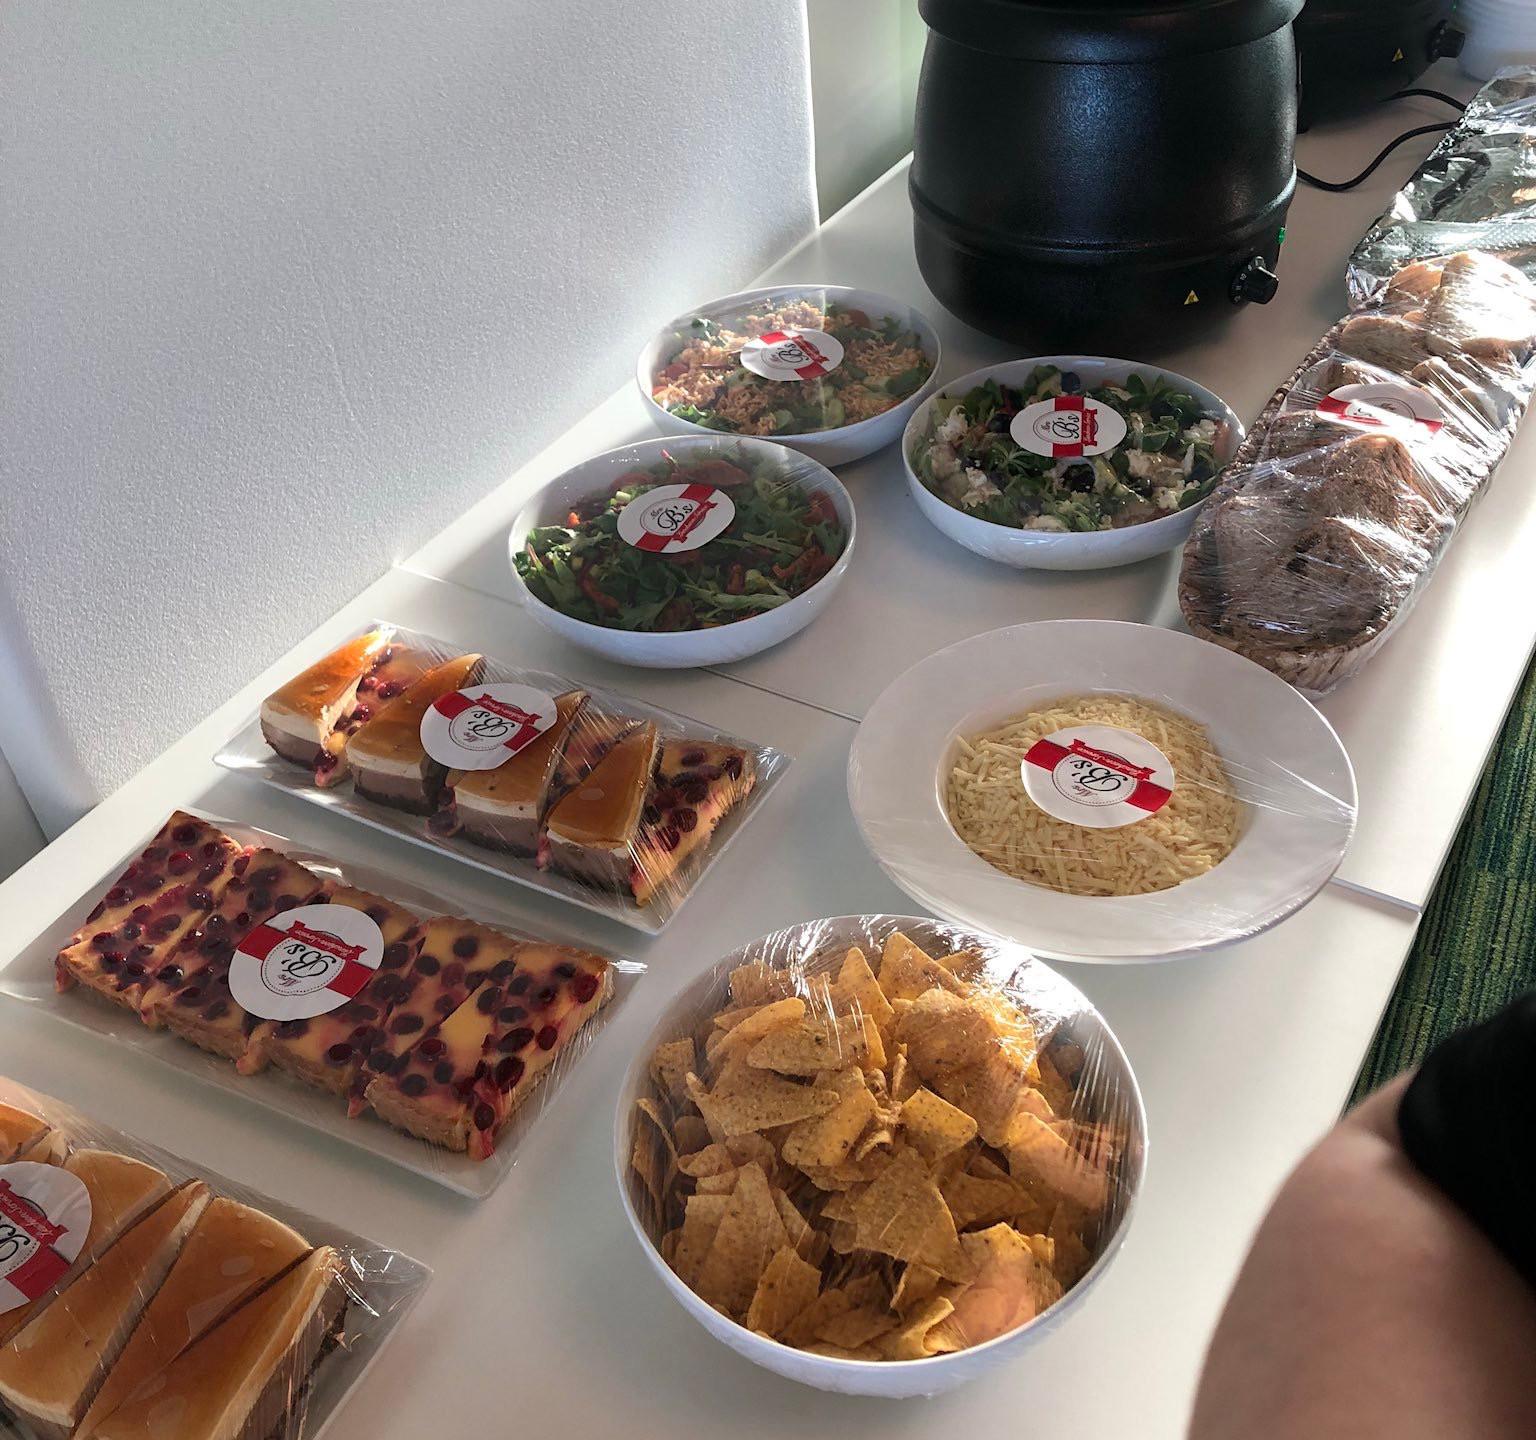 Mrs. B's Luncheons